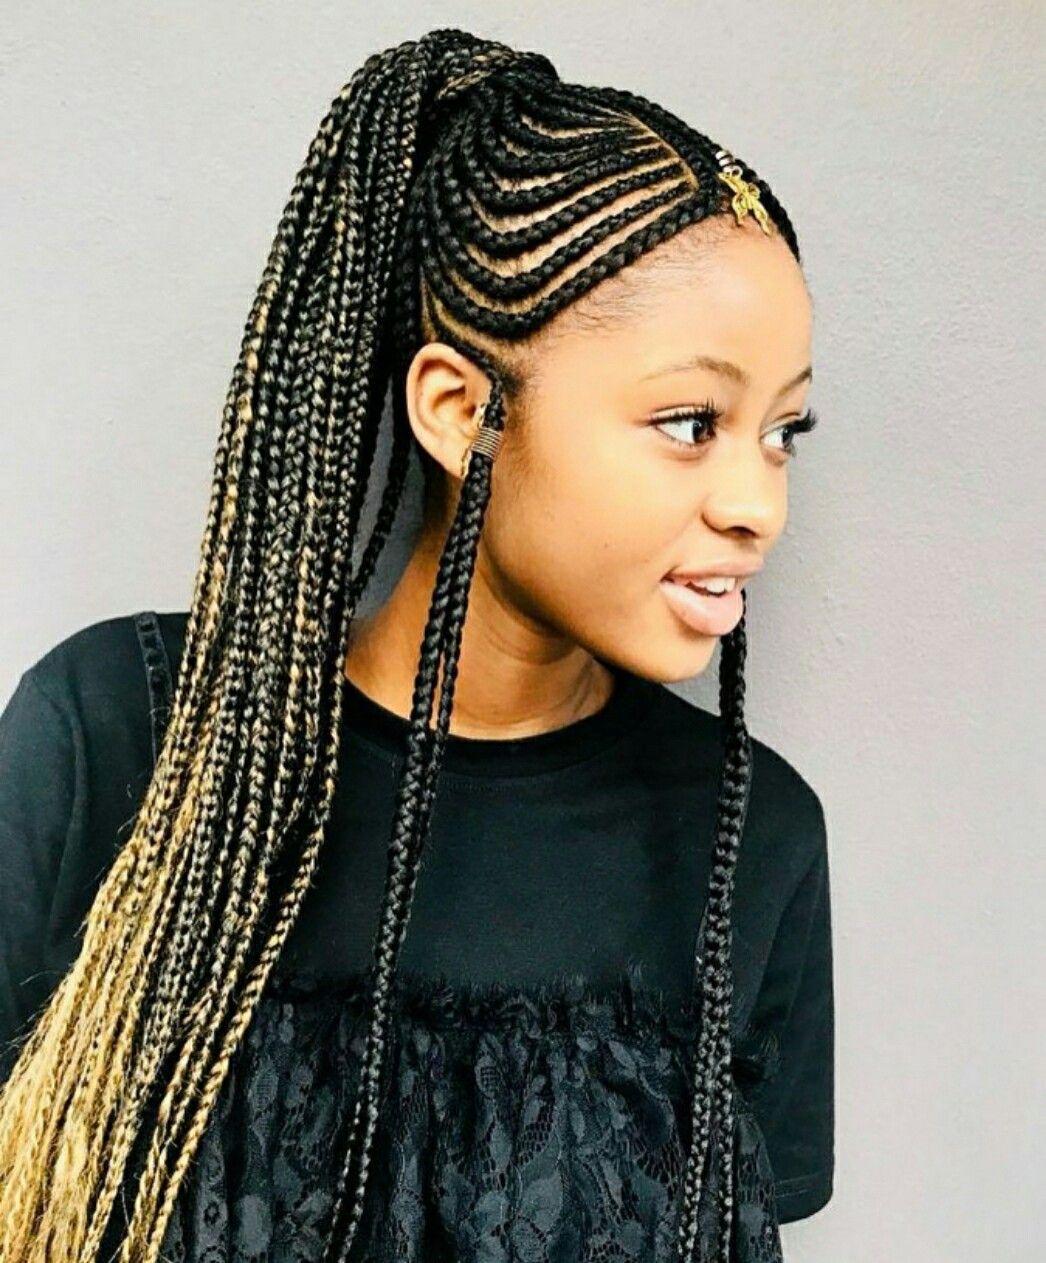 Pin By Merry Loum On Ghana Braids Cool Braid Hairstyles Braided Hairstyles Natural Hair Styles